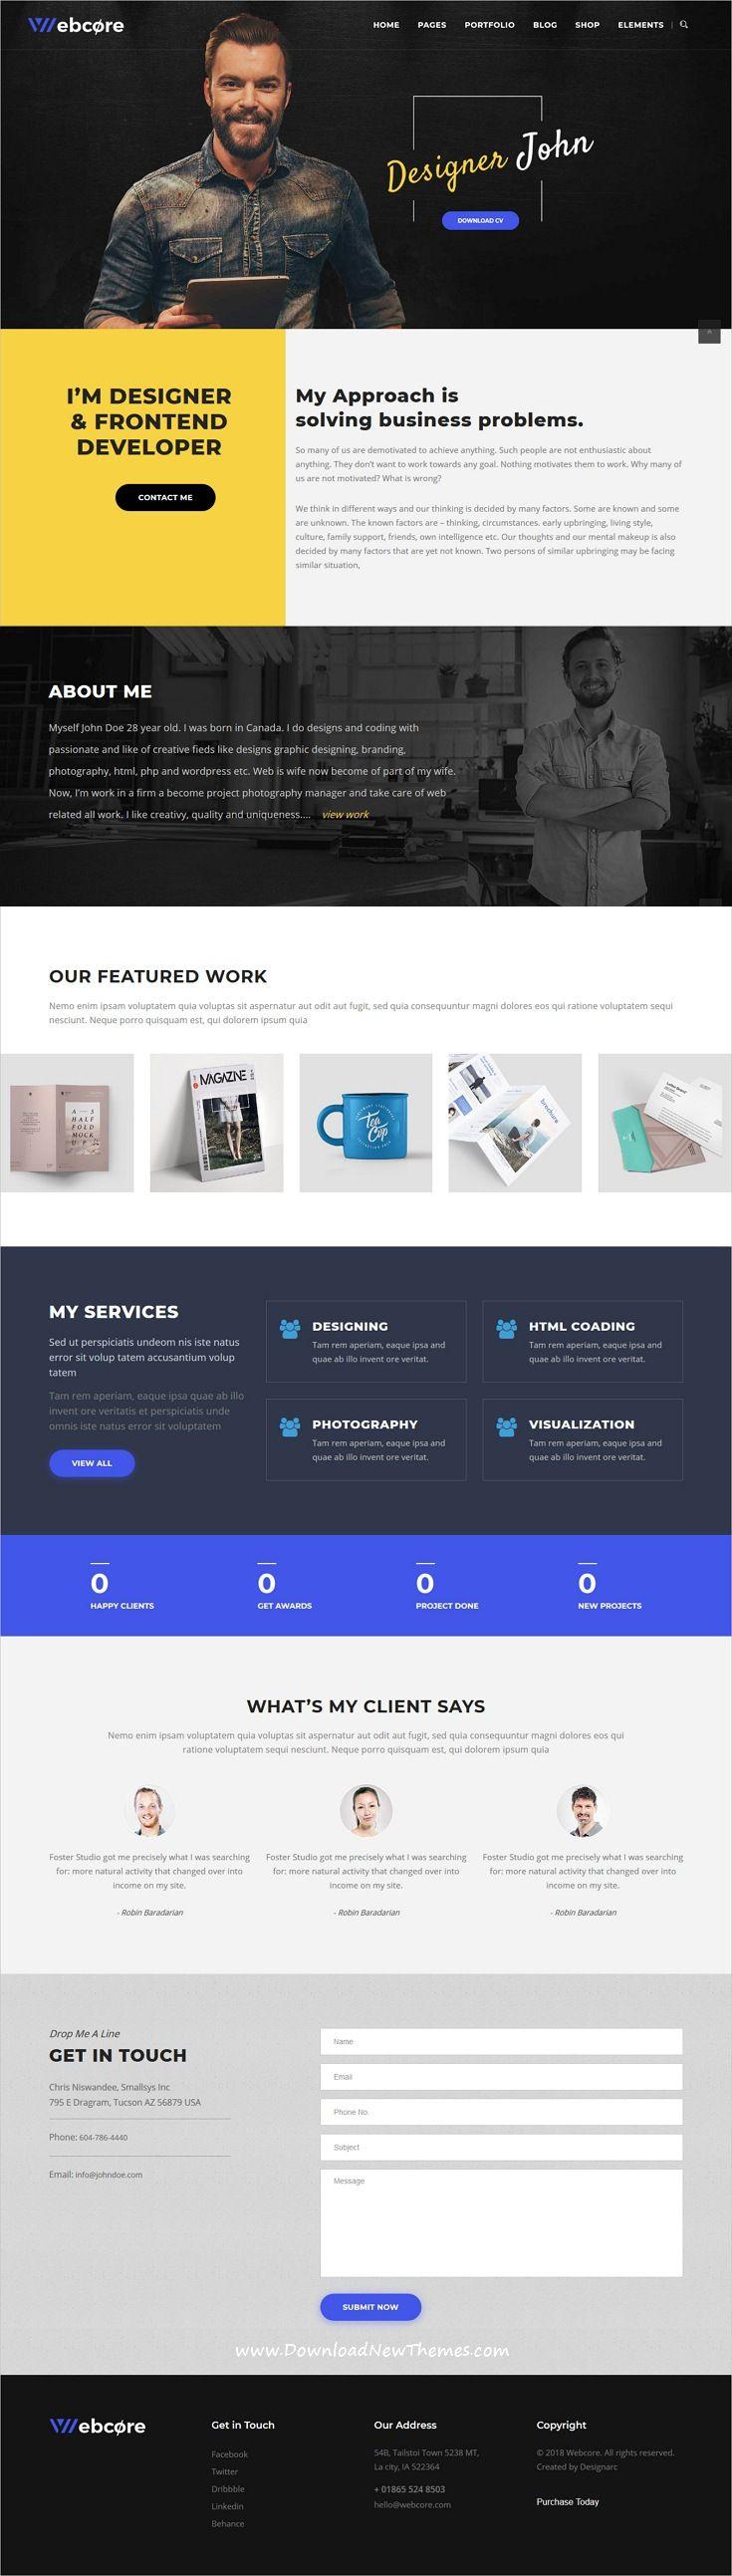 Webcore Portfolio And Agency Wordpress Theme Business Web Design Web Design Agency Web Design Tips